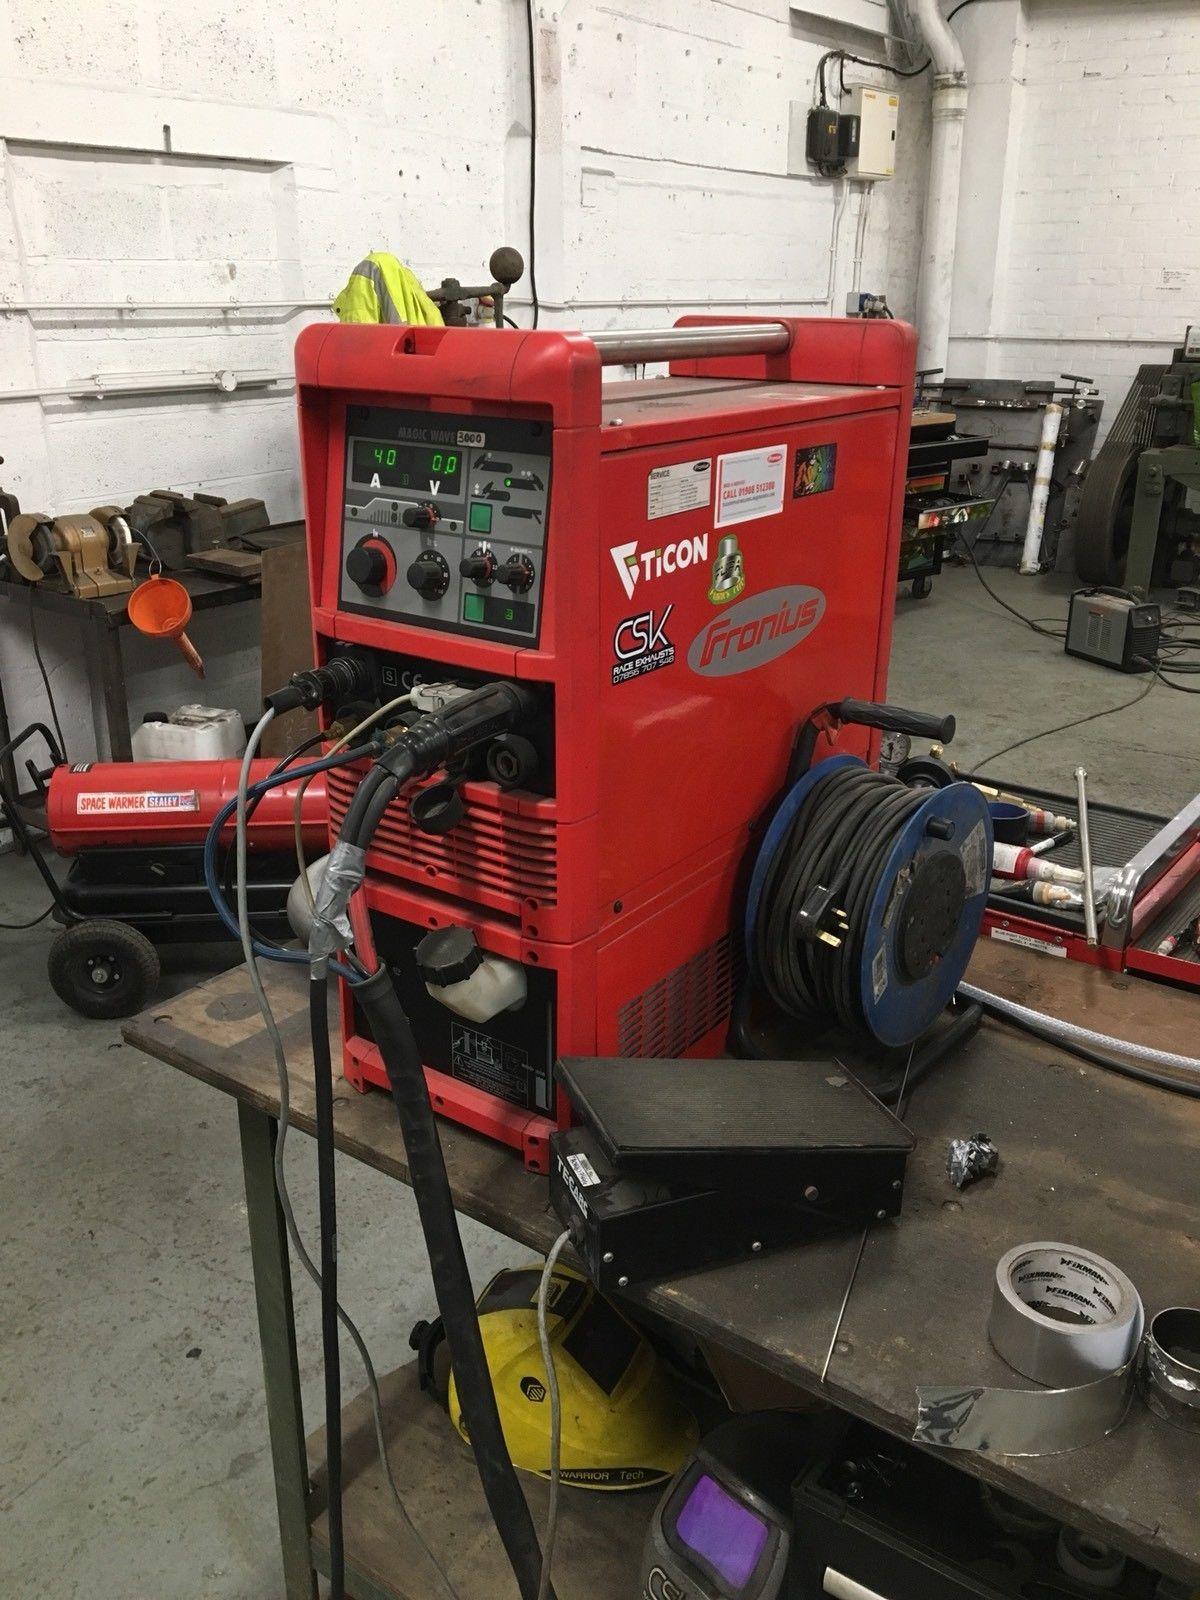 Fronius Tig Welder Ac Dc Magicwave 3000 Mig Plasma Power Lincoln Invertec 275 Parts